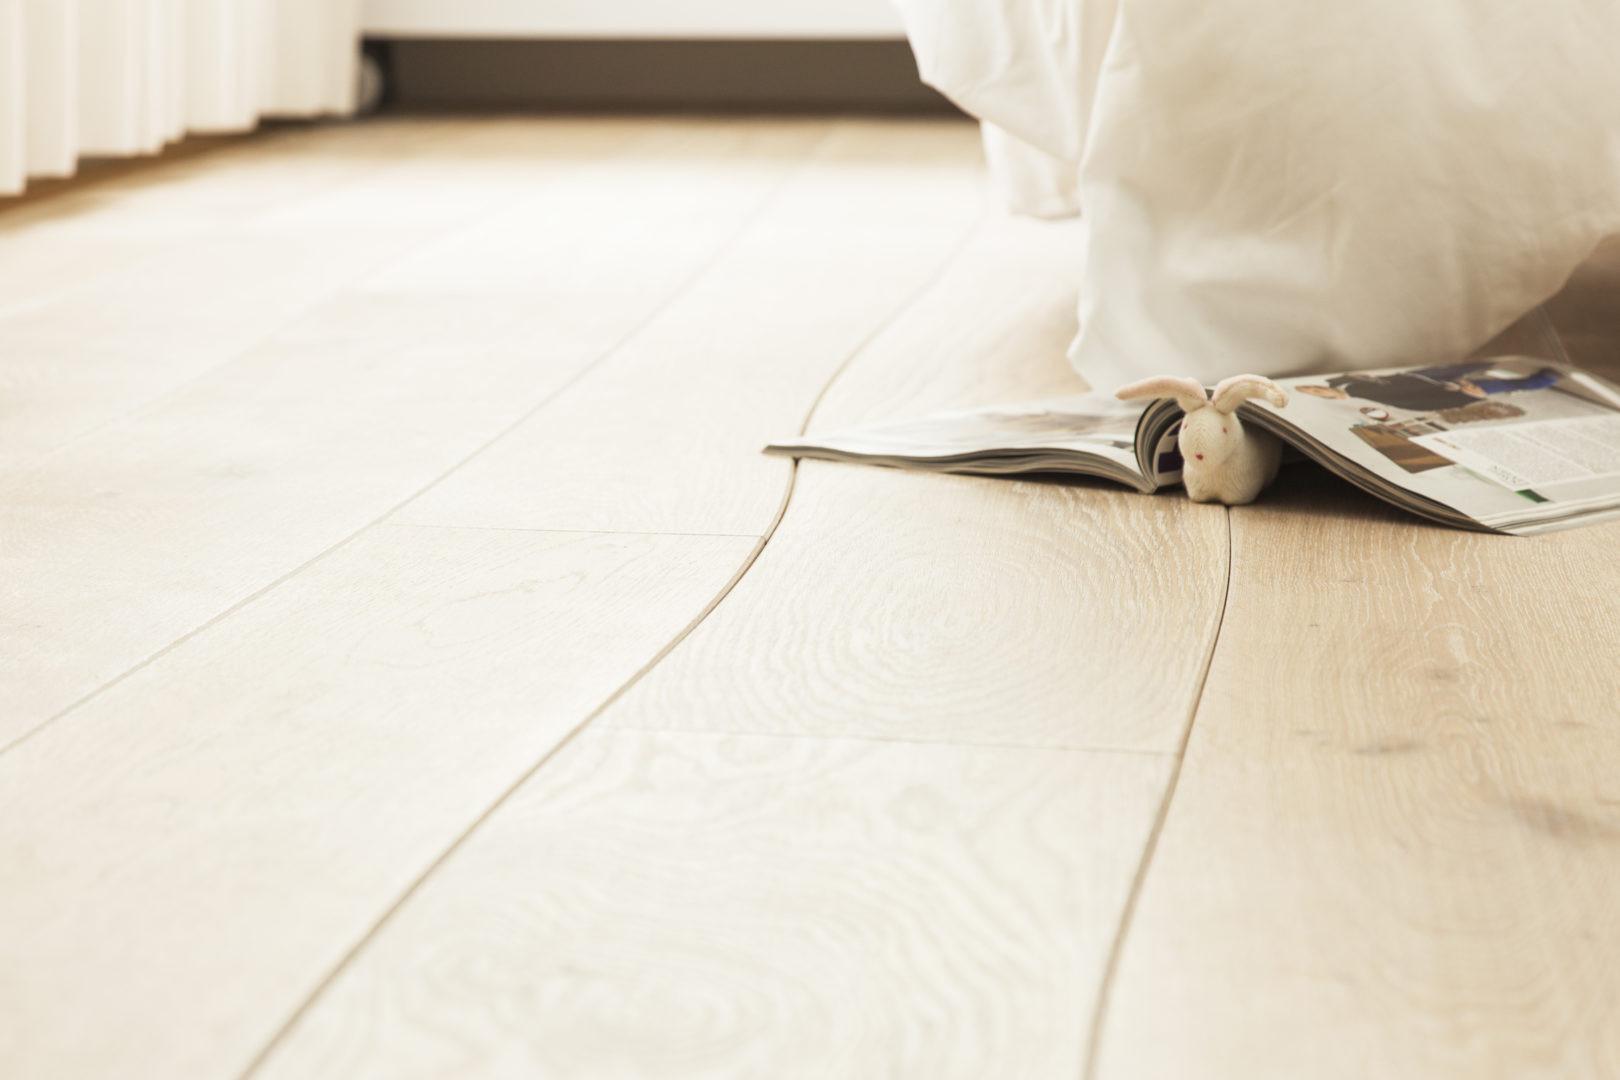 hardwood floor refinishing central nj of bole life is not a straight line regarding bole modular curv8 bedroom with white oil